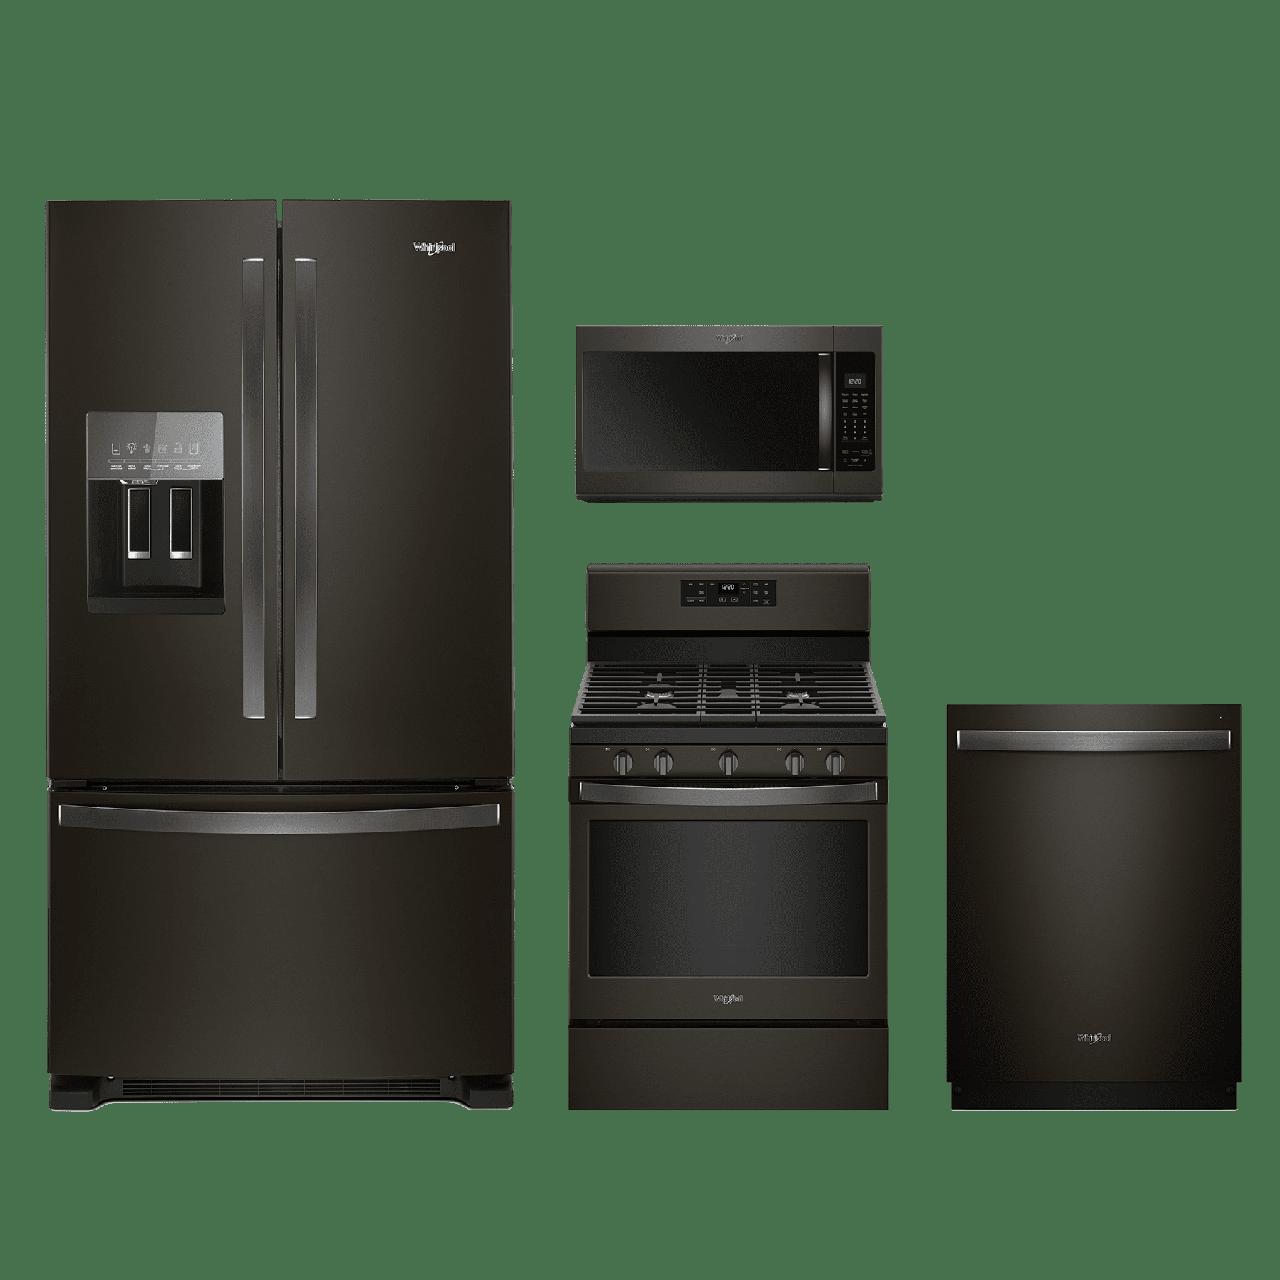 Whirlpool 4 Piece Kitchen Package Fingerprint Resistant Black Stainless Steel Whkitwfg525s0hv